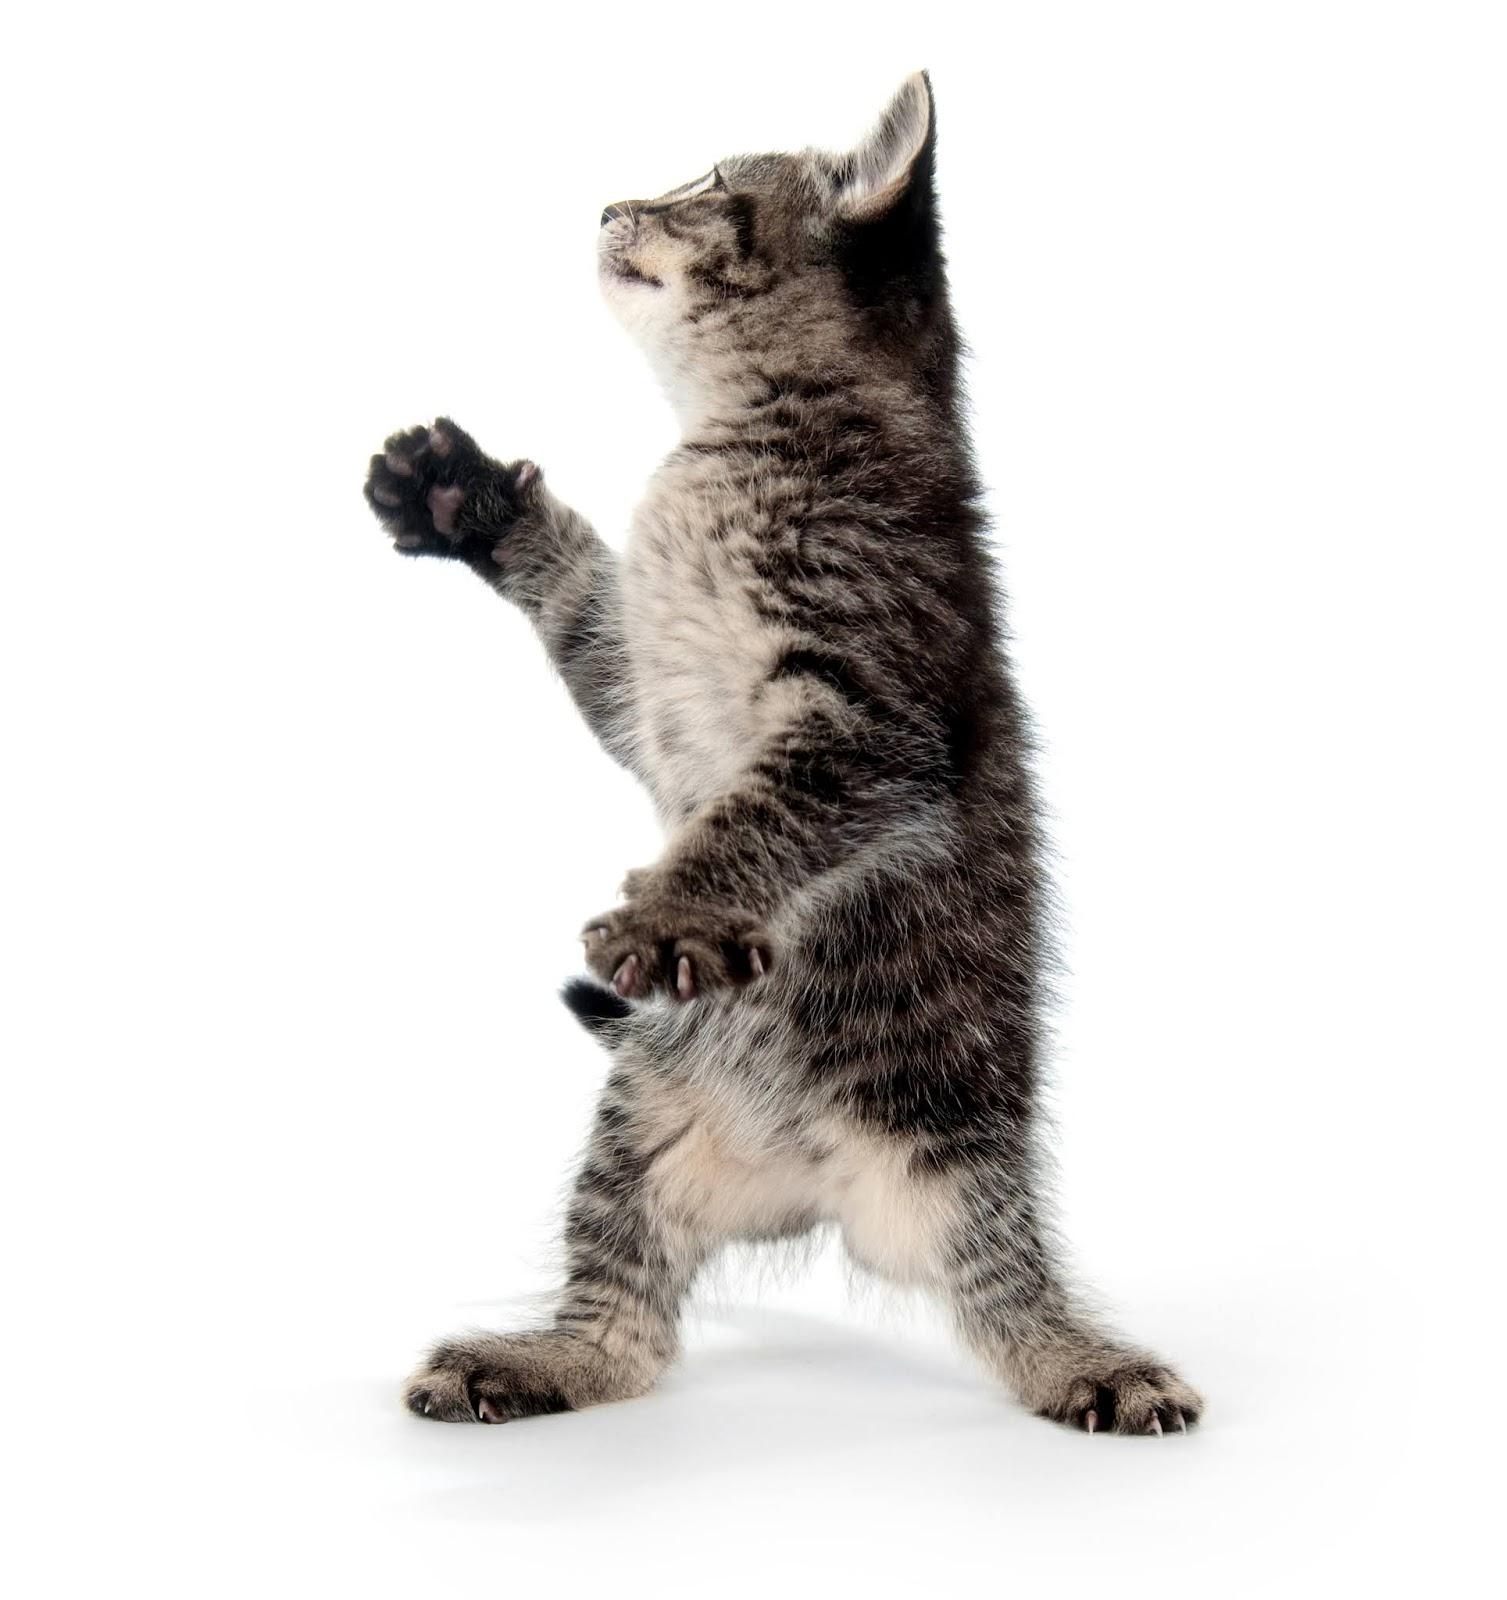 анимашка танцующий кот